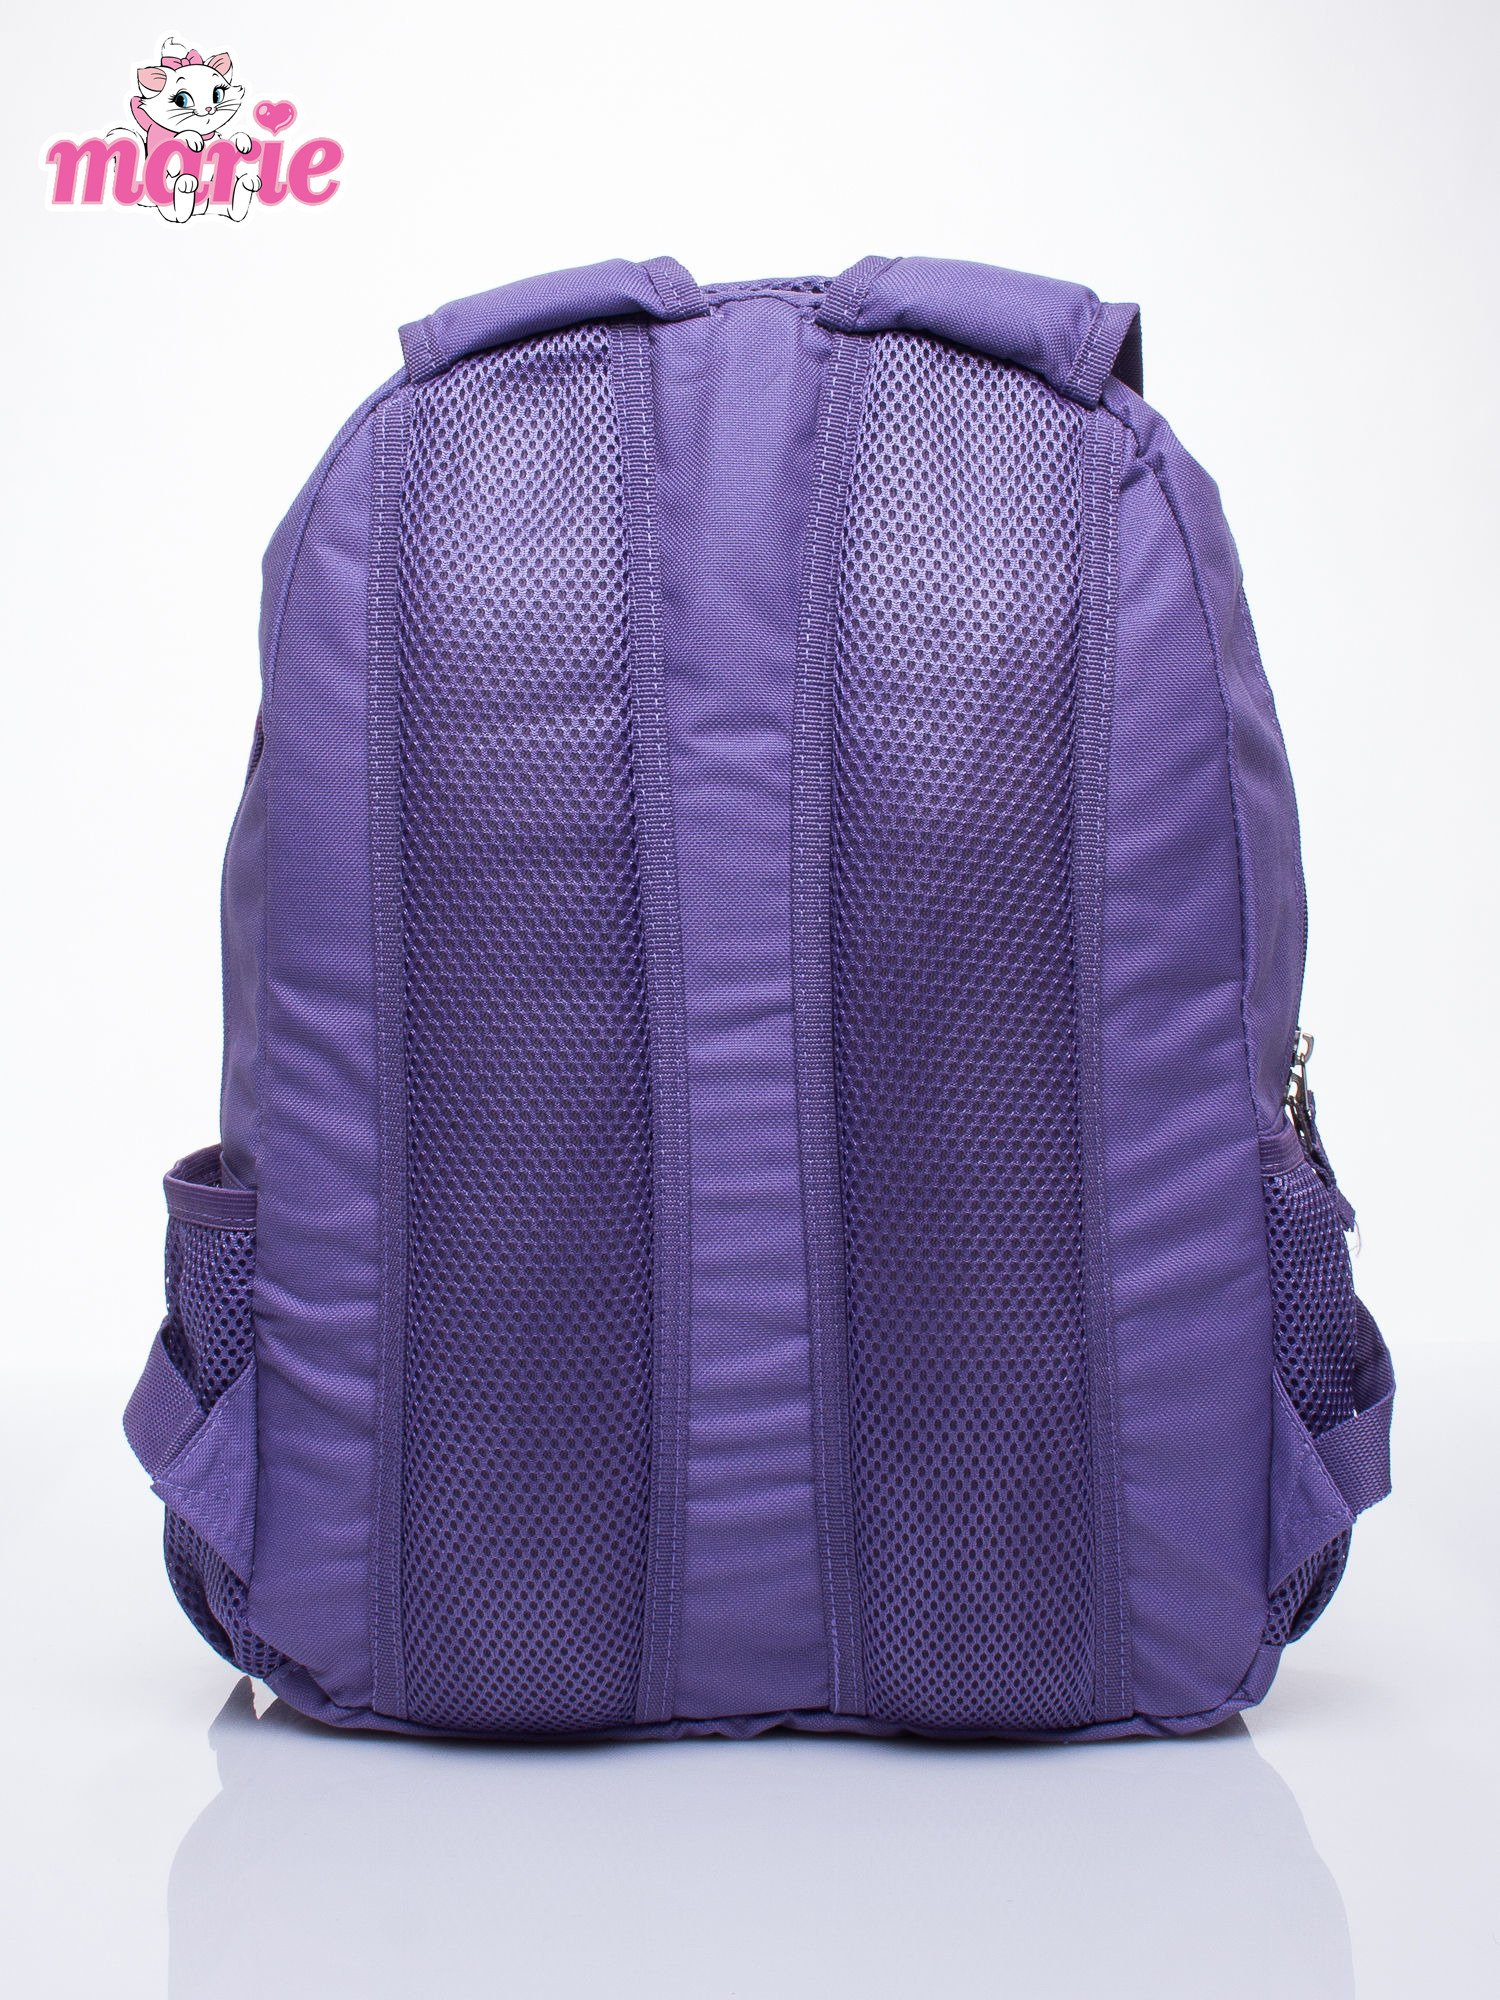 Fioletowy plecak szkolny DISNEY kotka Marie                                  zdj.                                  4